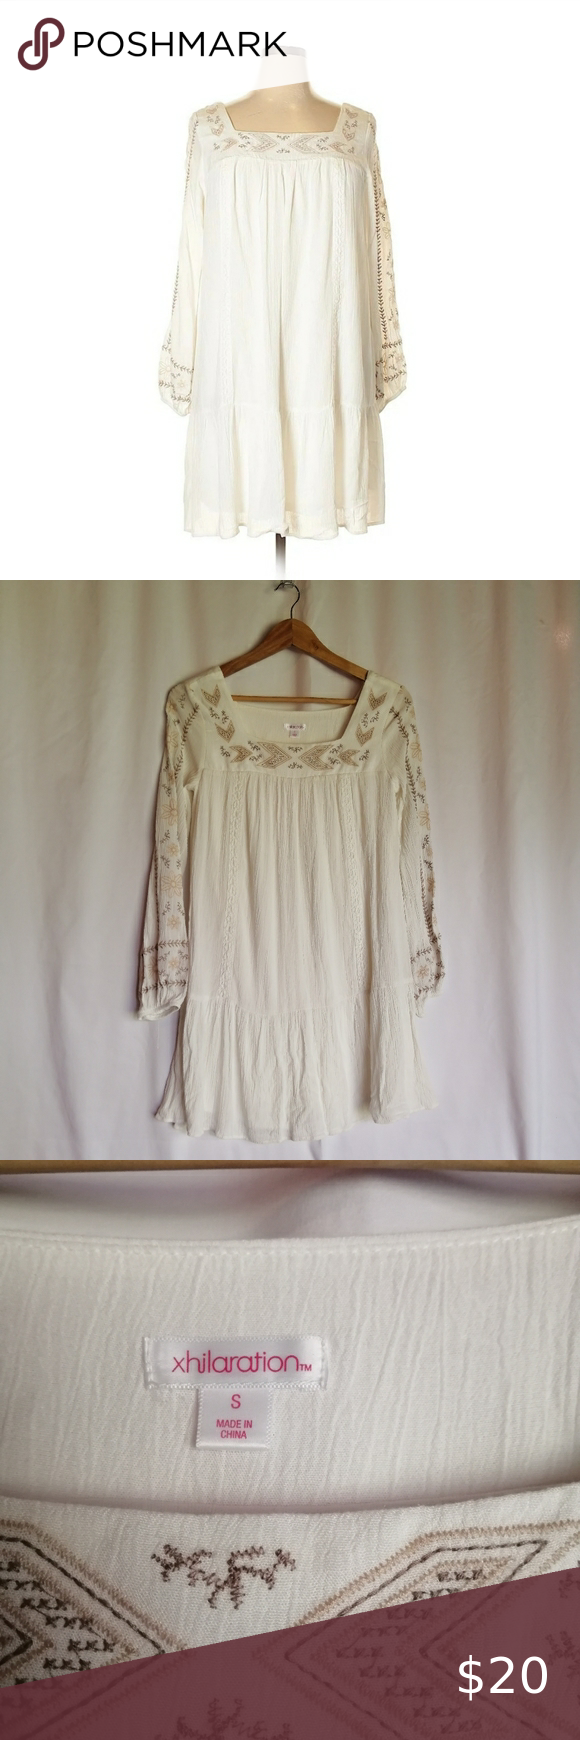 Boho Peasant Dress By Xhilaration Target Peasant Dress Boho Bohemian Style Dresses Long Sleeve Mini Dress [ 1740 x 580 Pixel ]